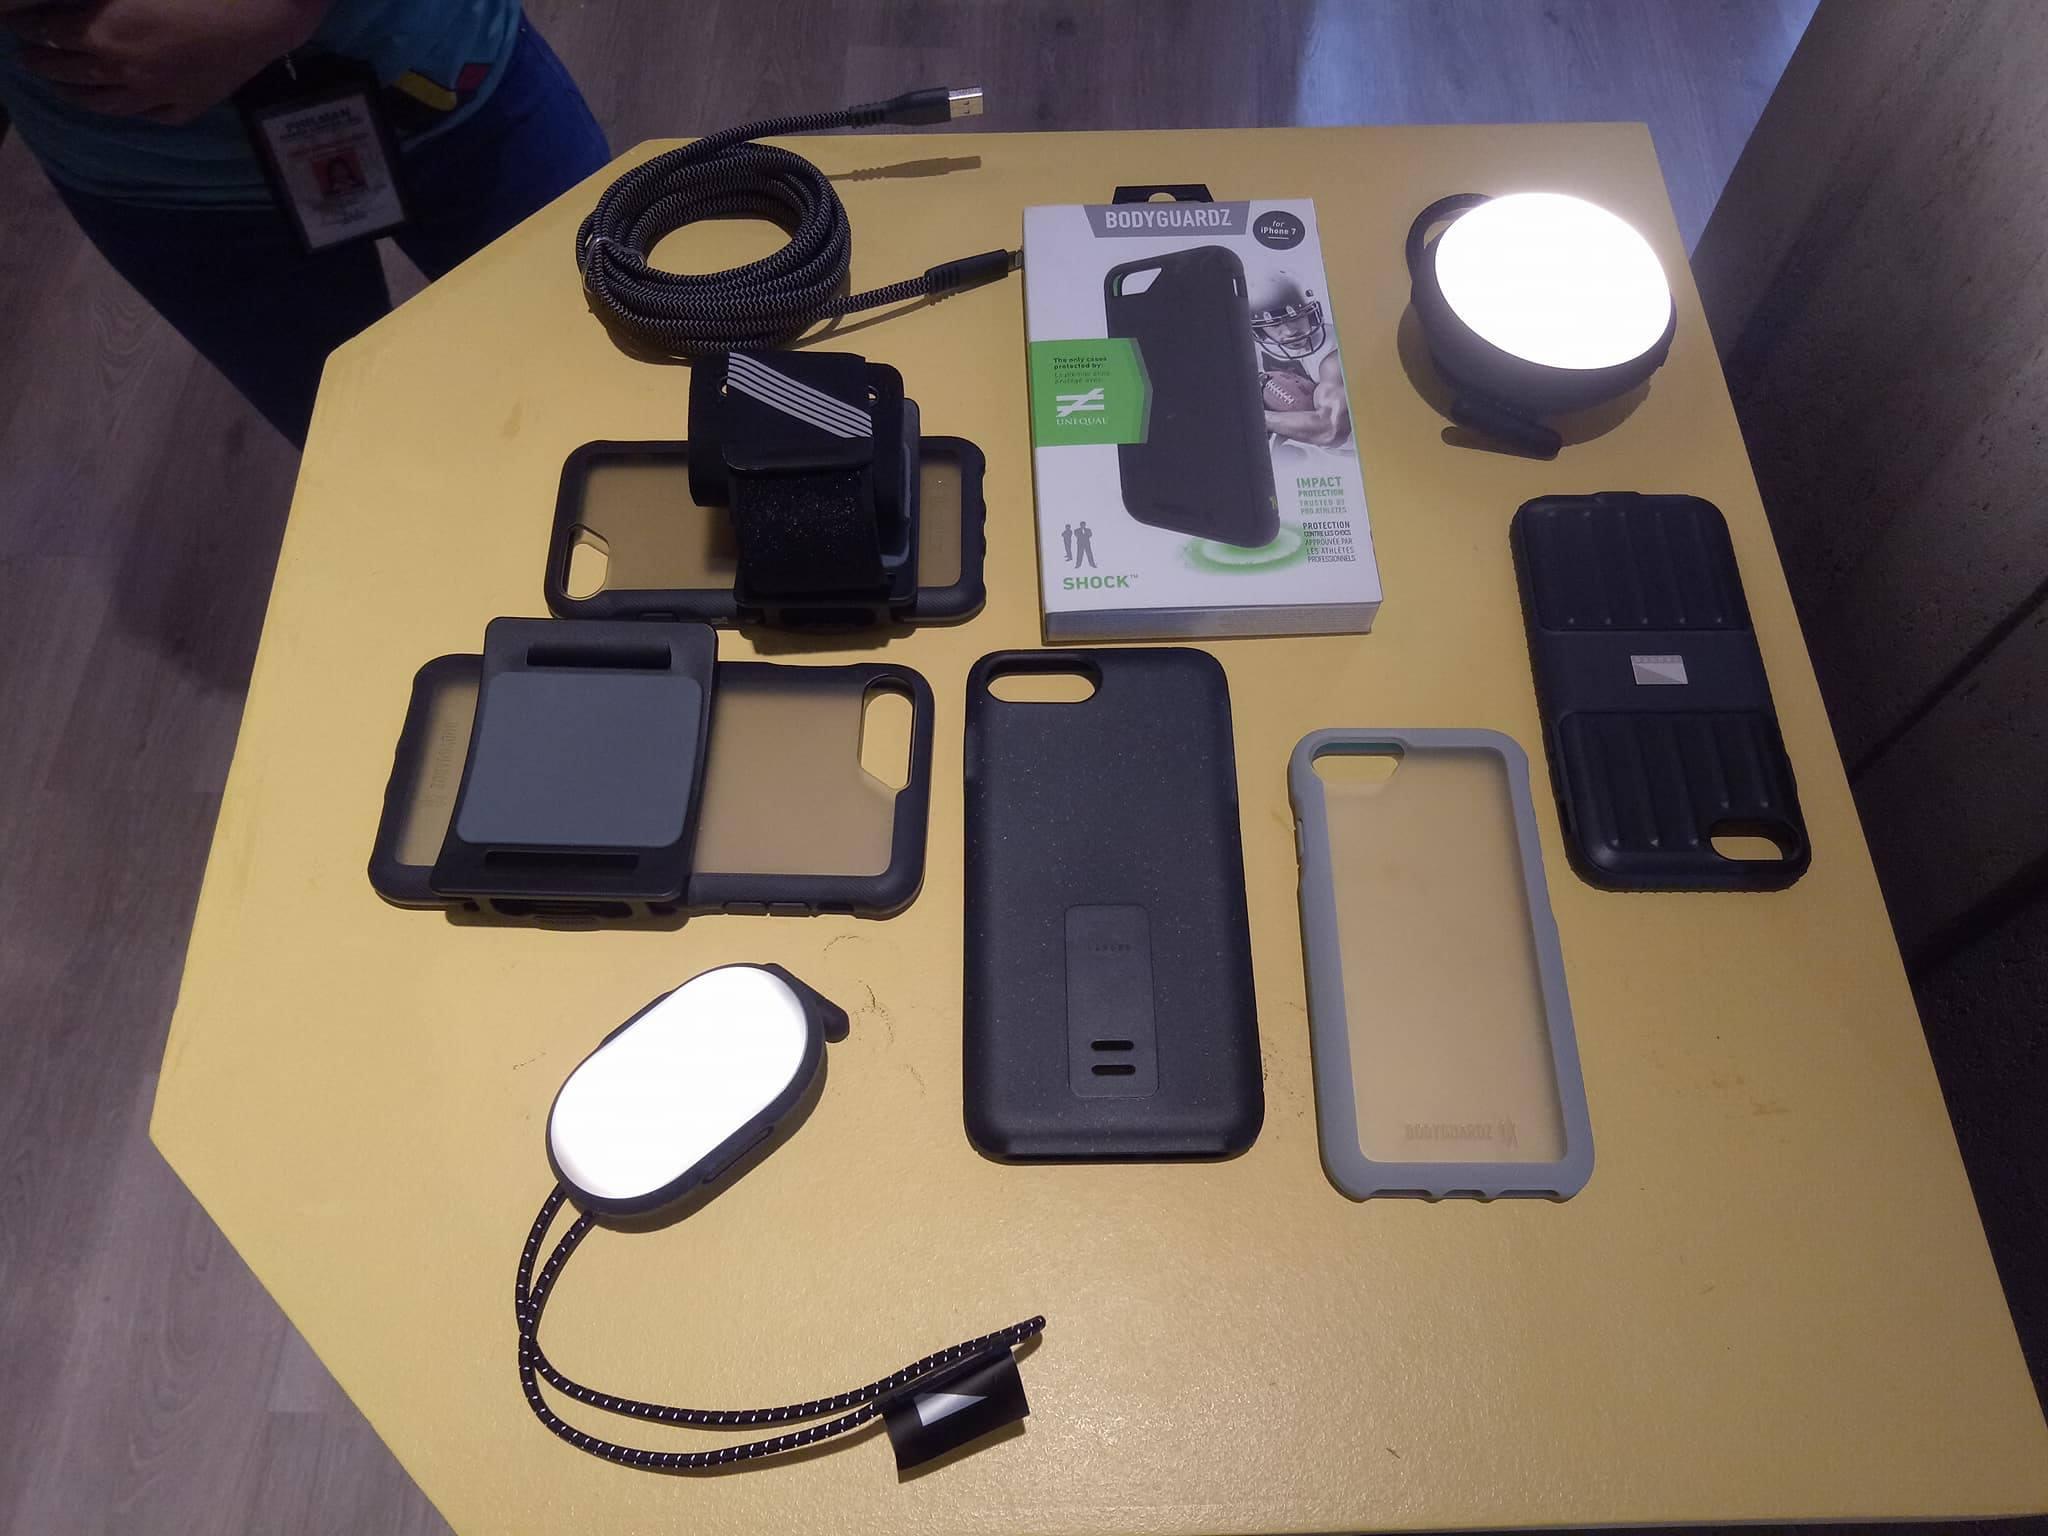 digital walker, iphone, iphone 7, iphone 7 plus, iphone 8, iphone 8 plus, iphone accessories, bgz, bodyguardz, lander, ace pro case, contact case, shock case, powell case